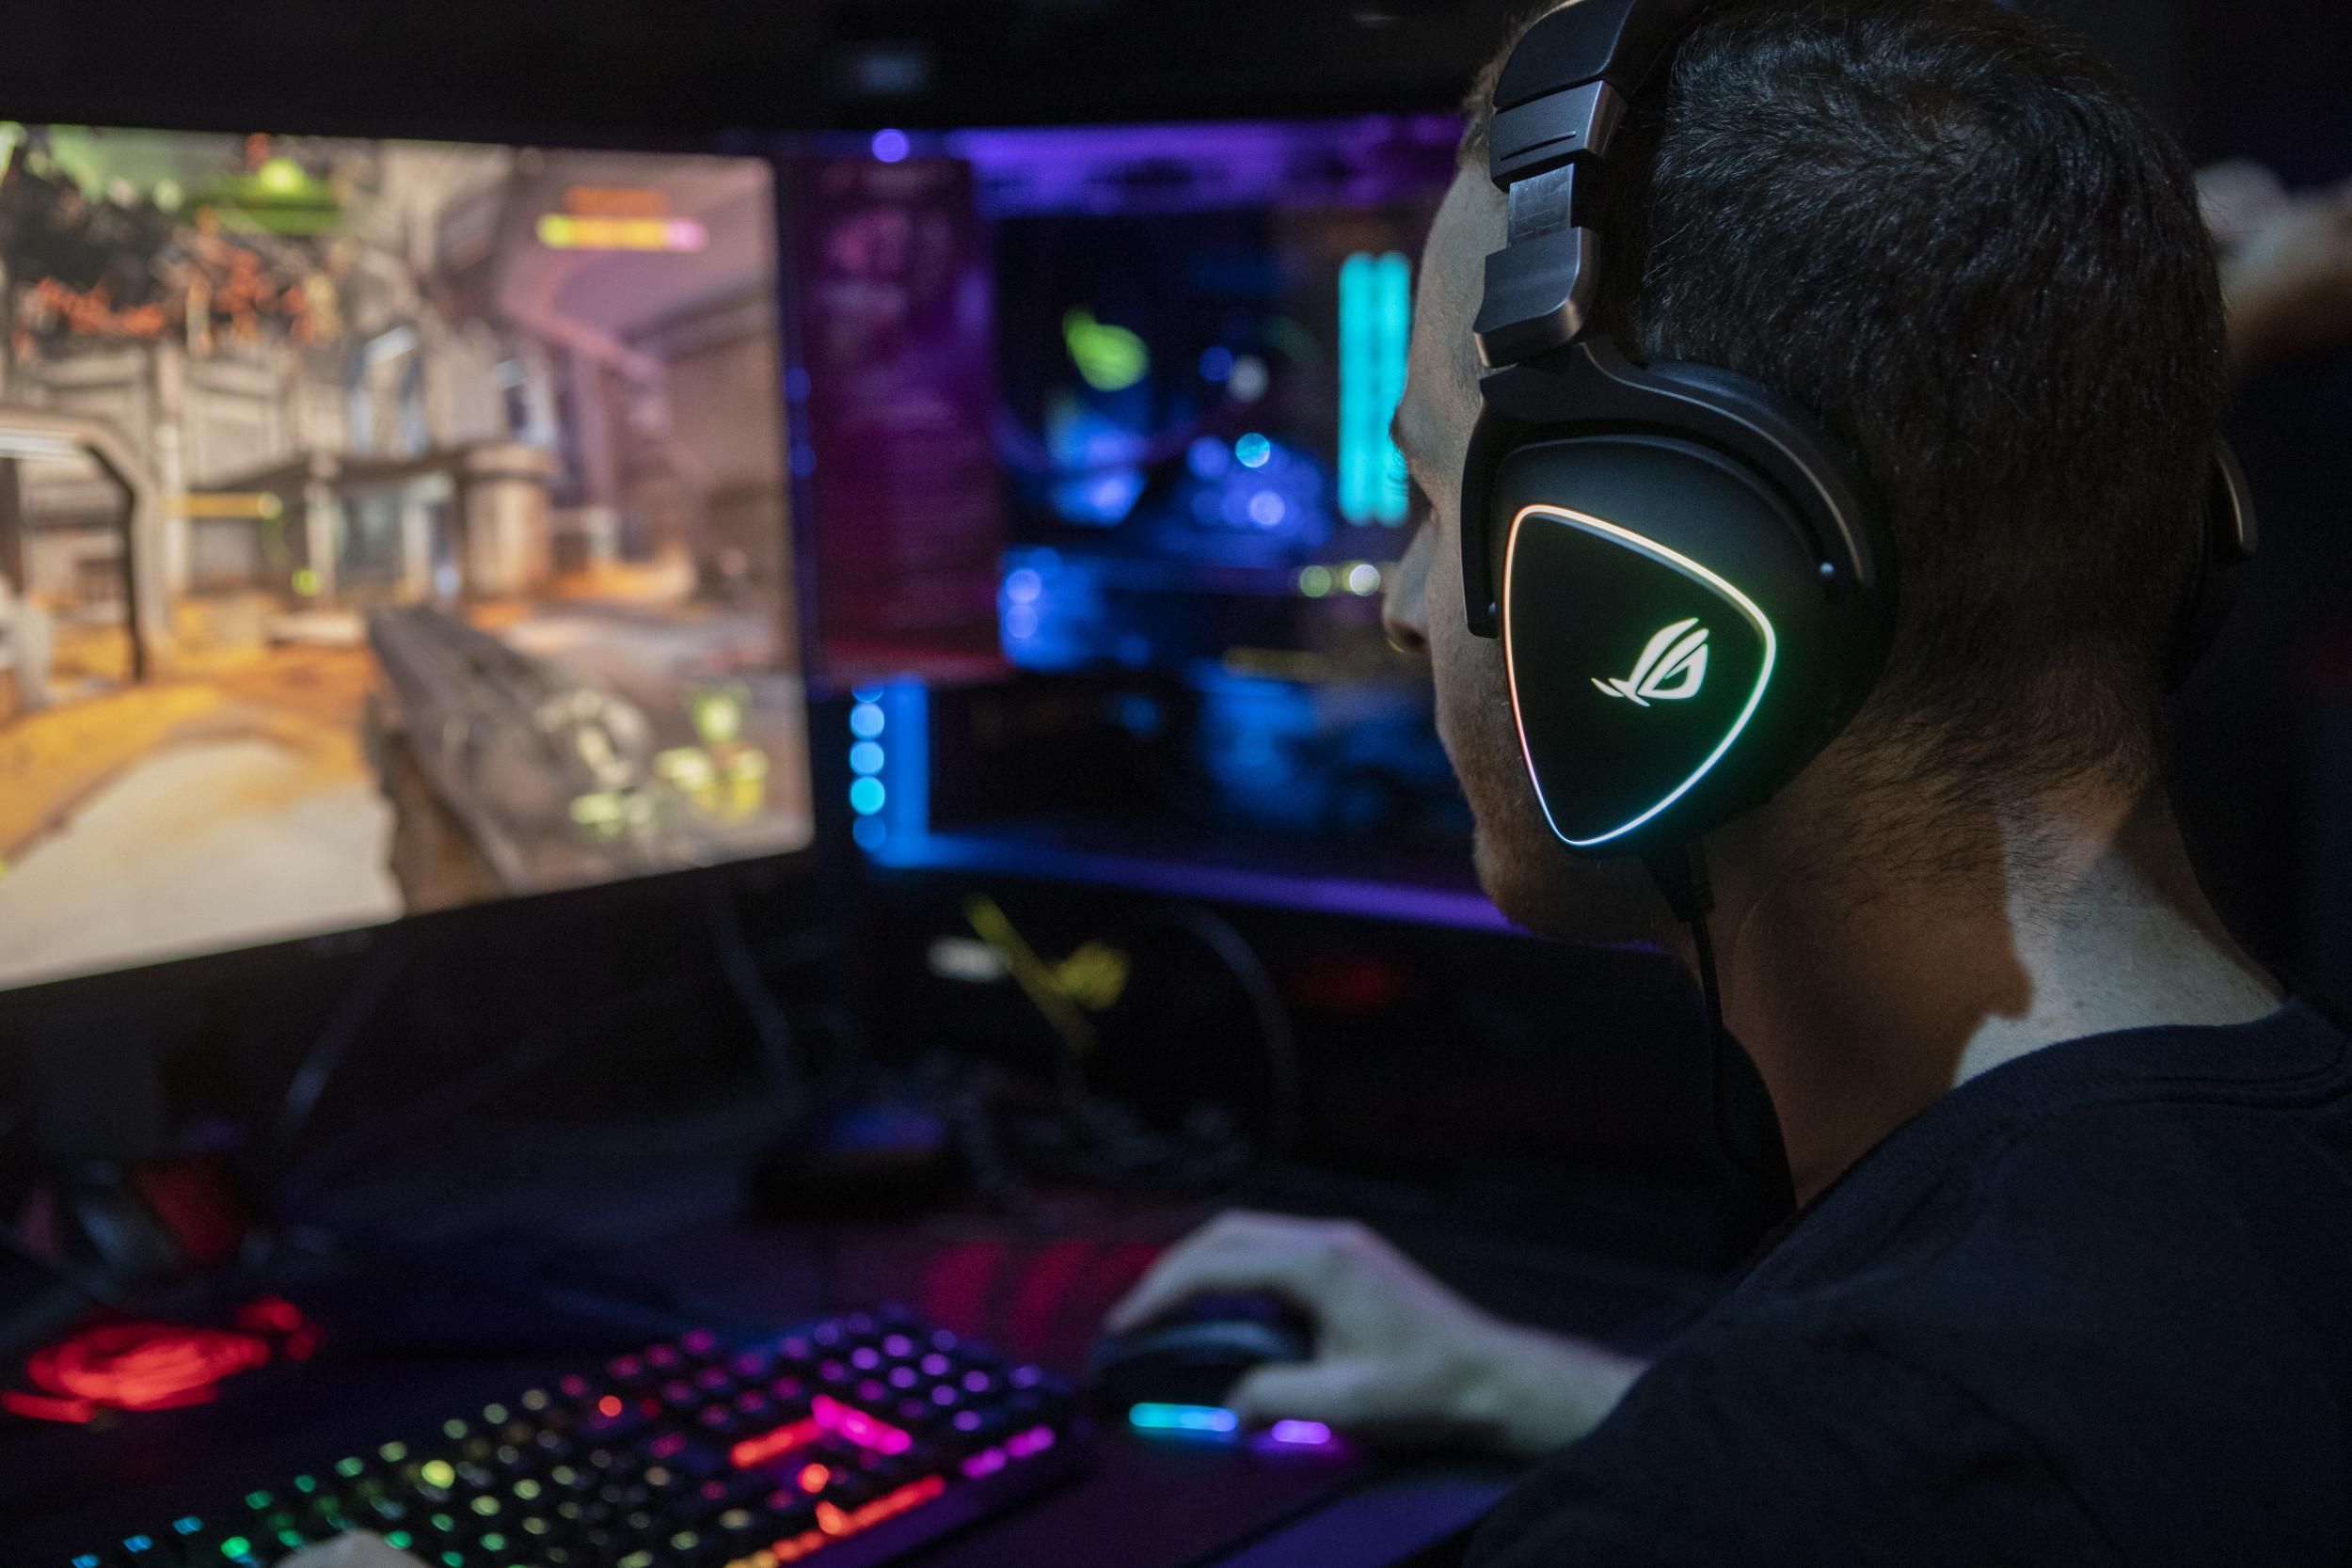 Black Friday 2019 Steam Autumn Sale Deals On Top Pc Games Sekiro Gta 5 Disco Elysium Far Cry Gears 5 And More